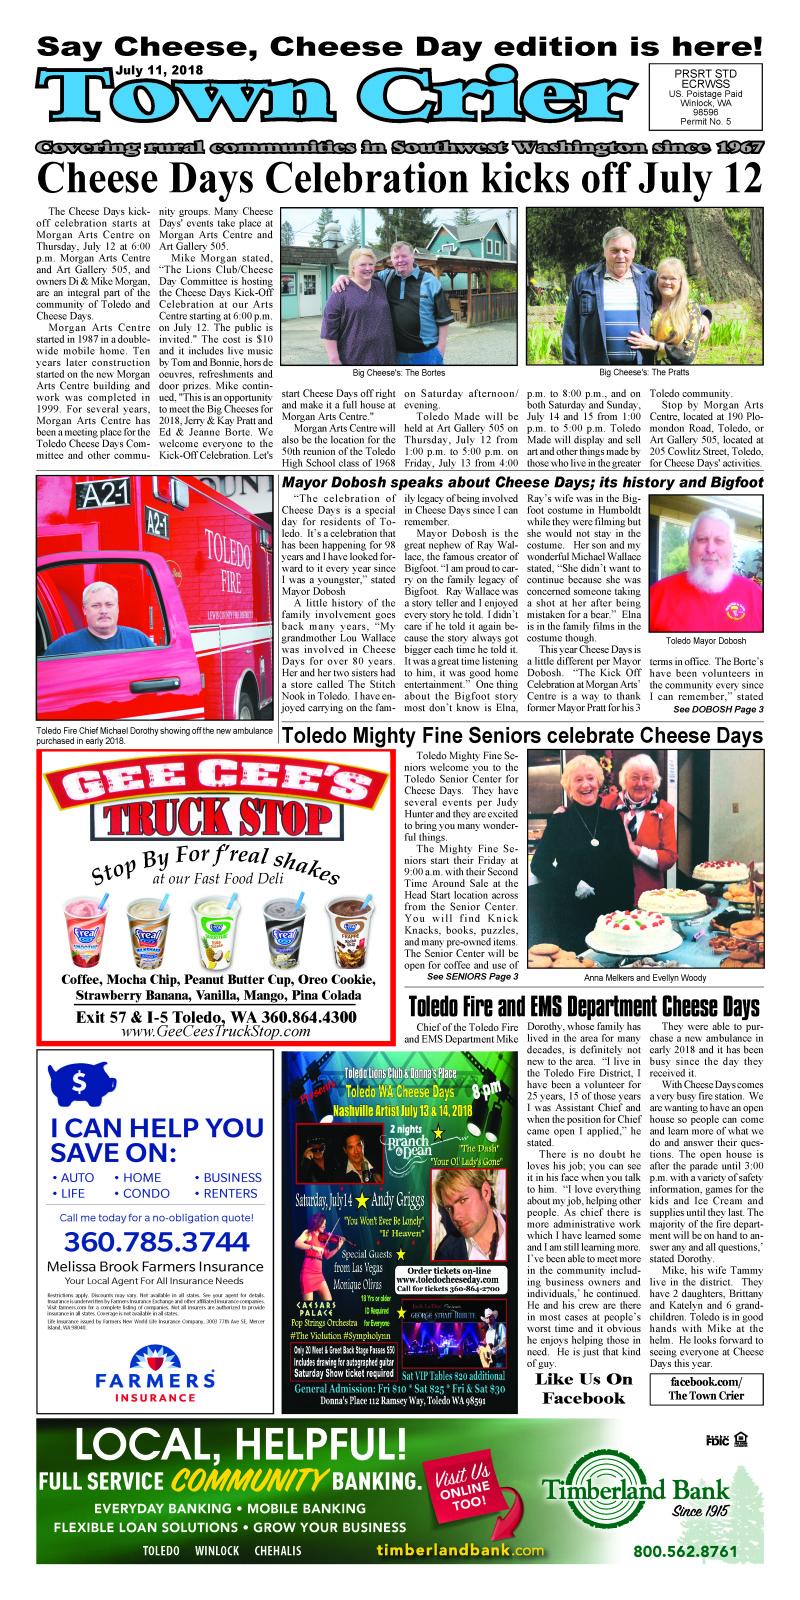 July 11, 2018 Town Crier